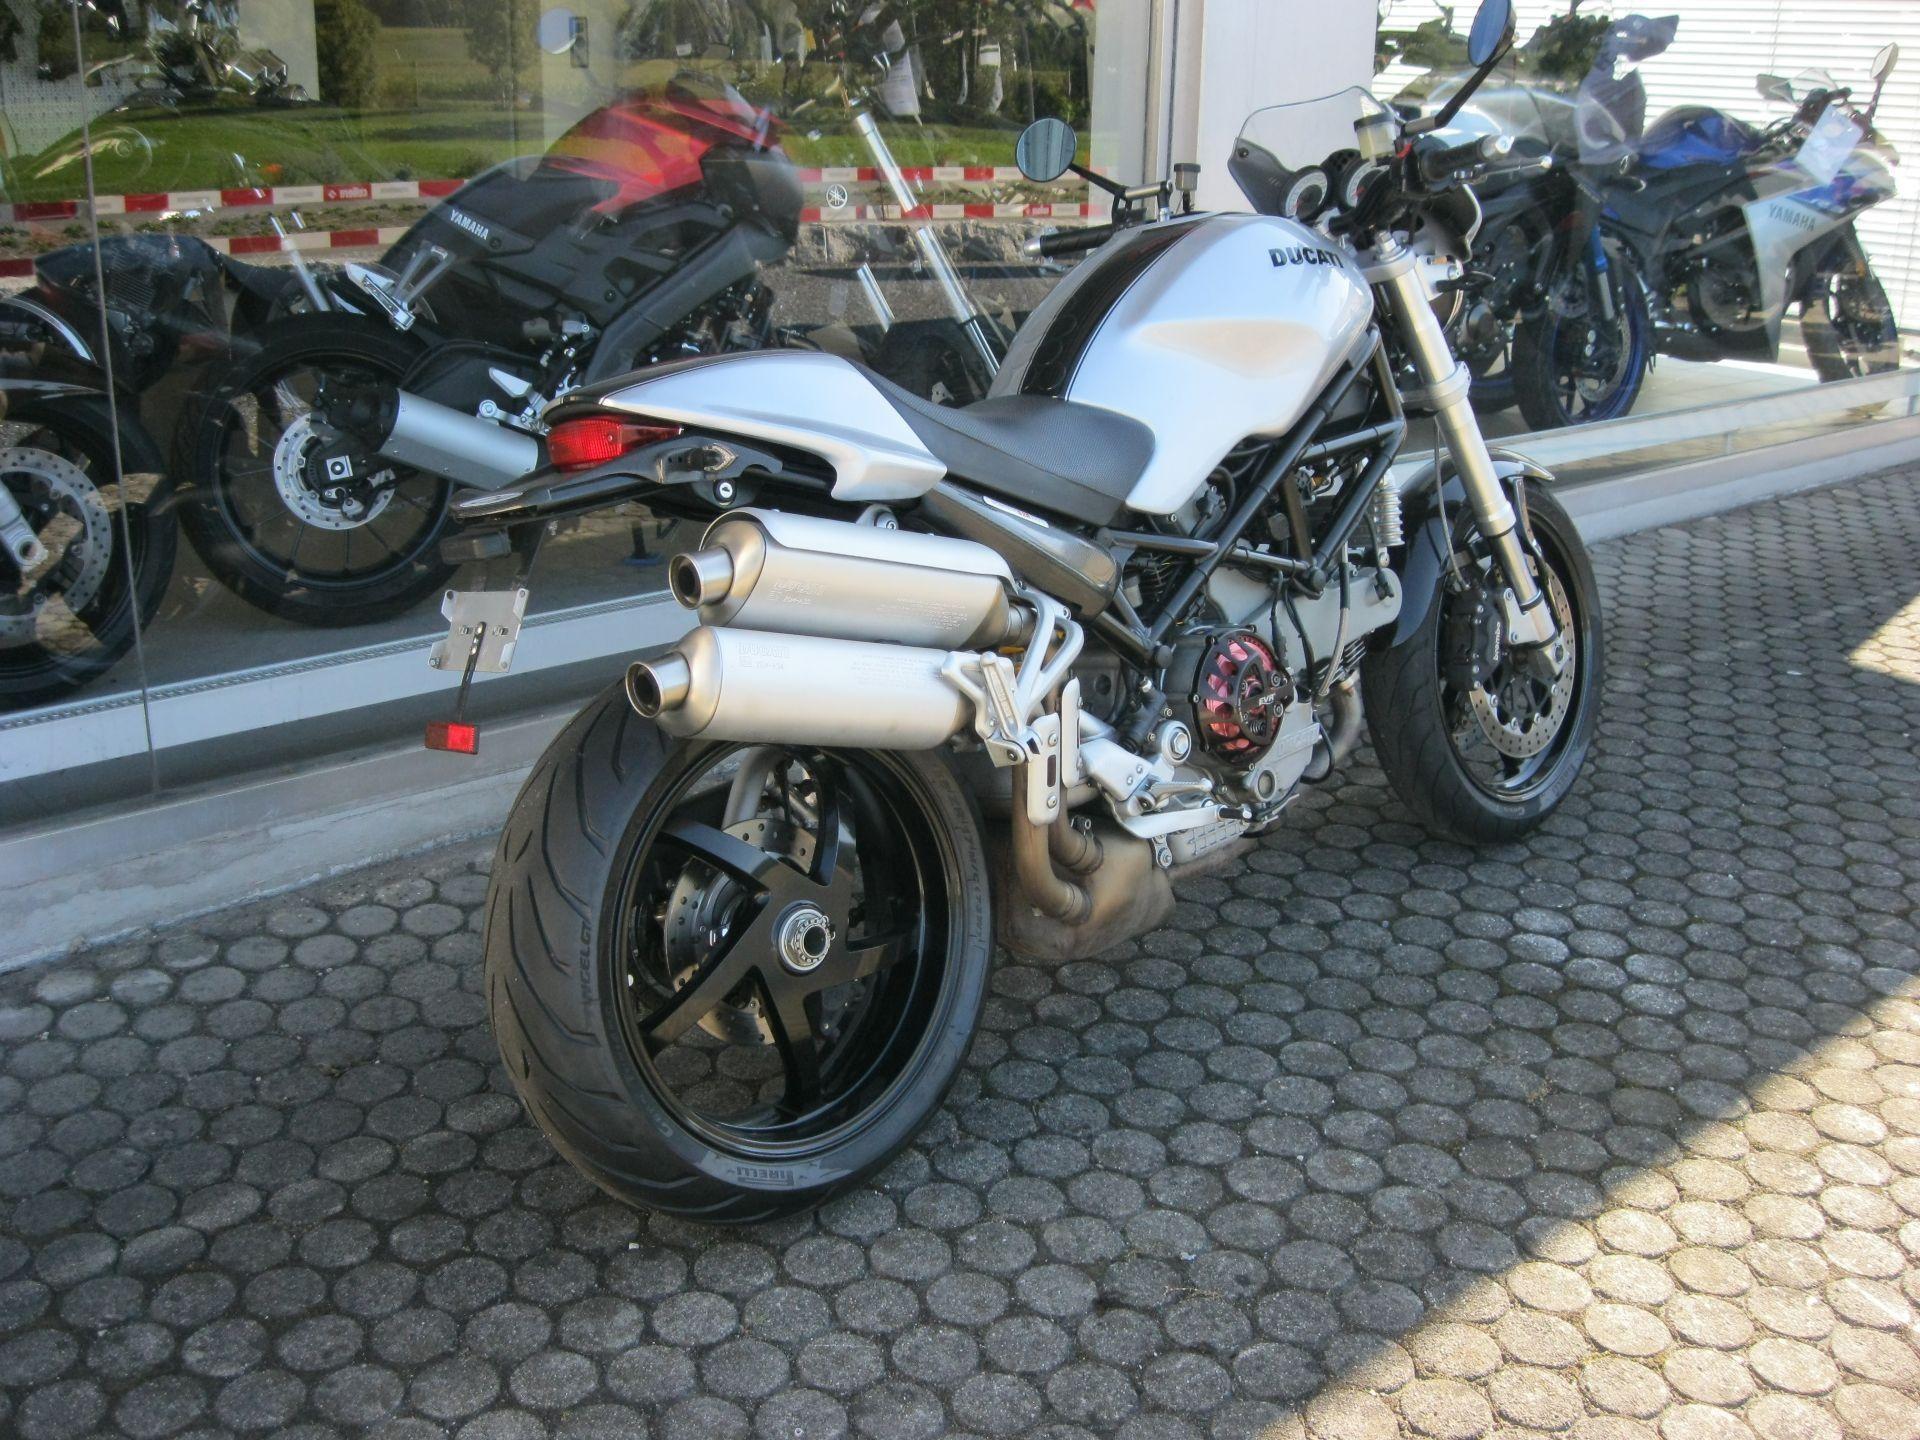 motorrad occasion kaufen ducati 1000 monster s2r zecchini. Black Bedroom Furniture Sets. Home Design Ideas